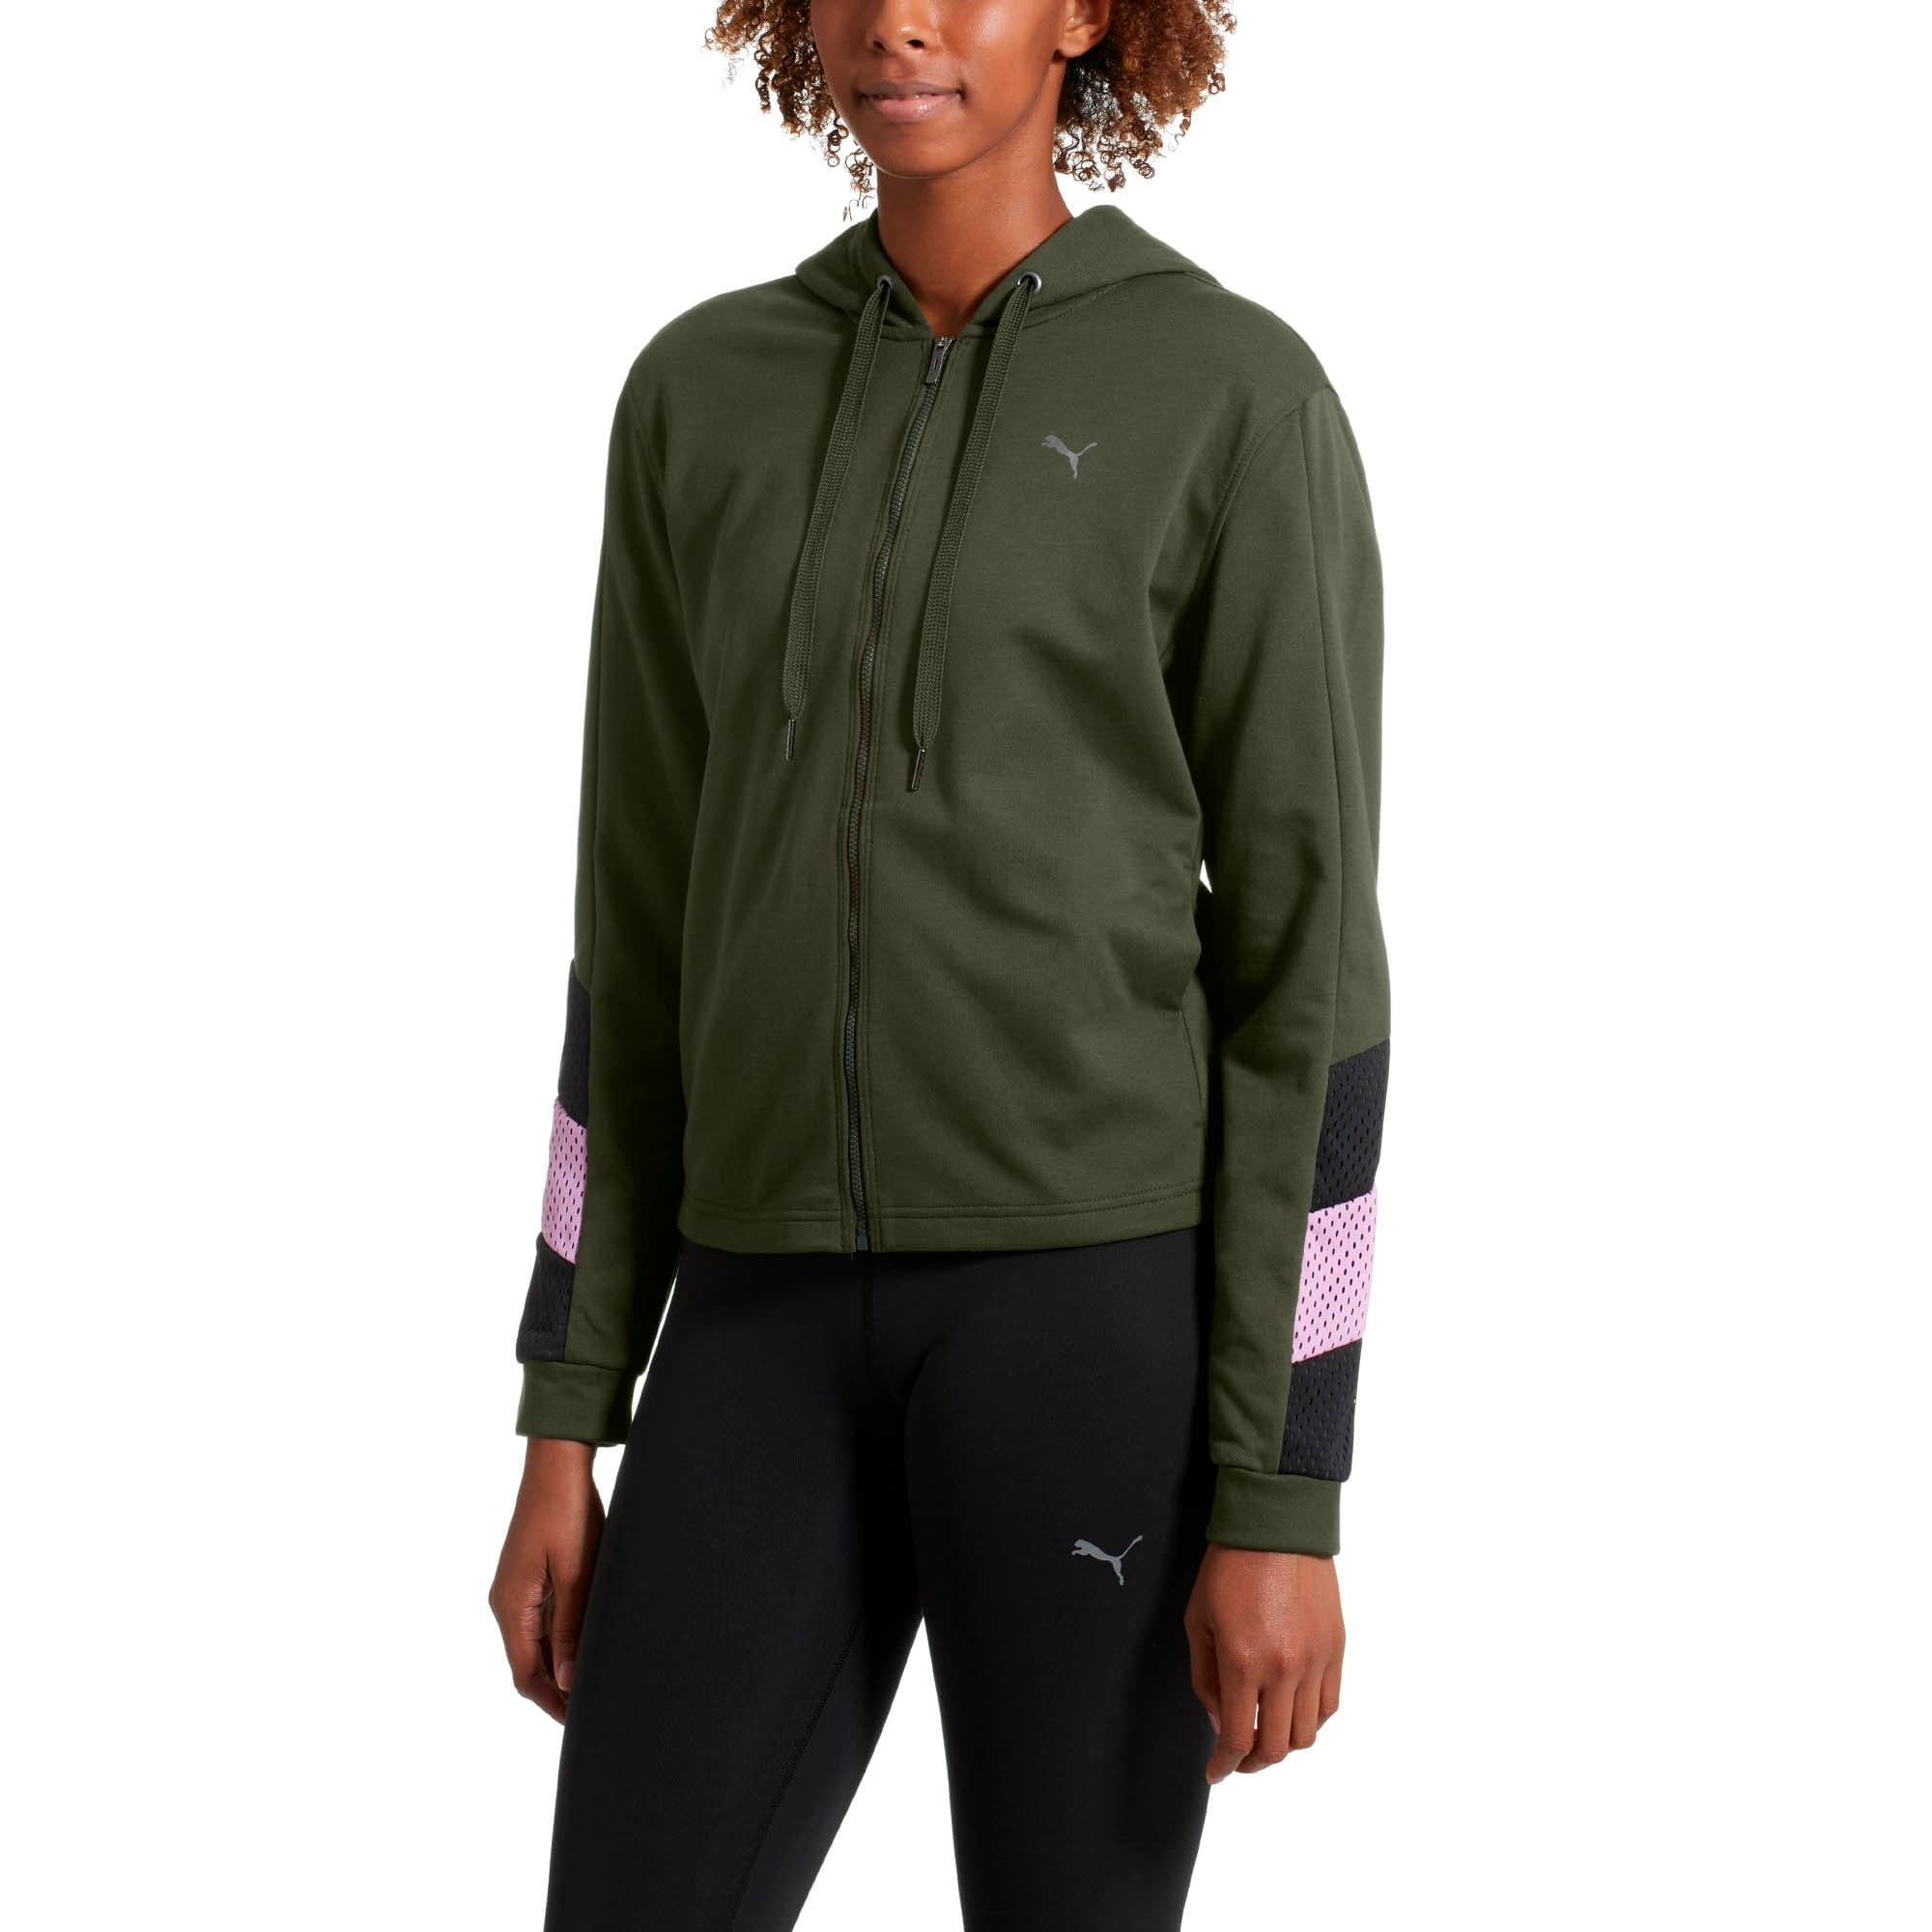 Thumbnail 2 of Training Women's A.C.E. Sweat Jacket, Forest Night, medium